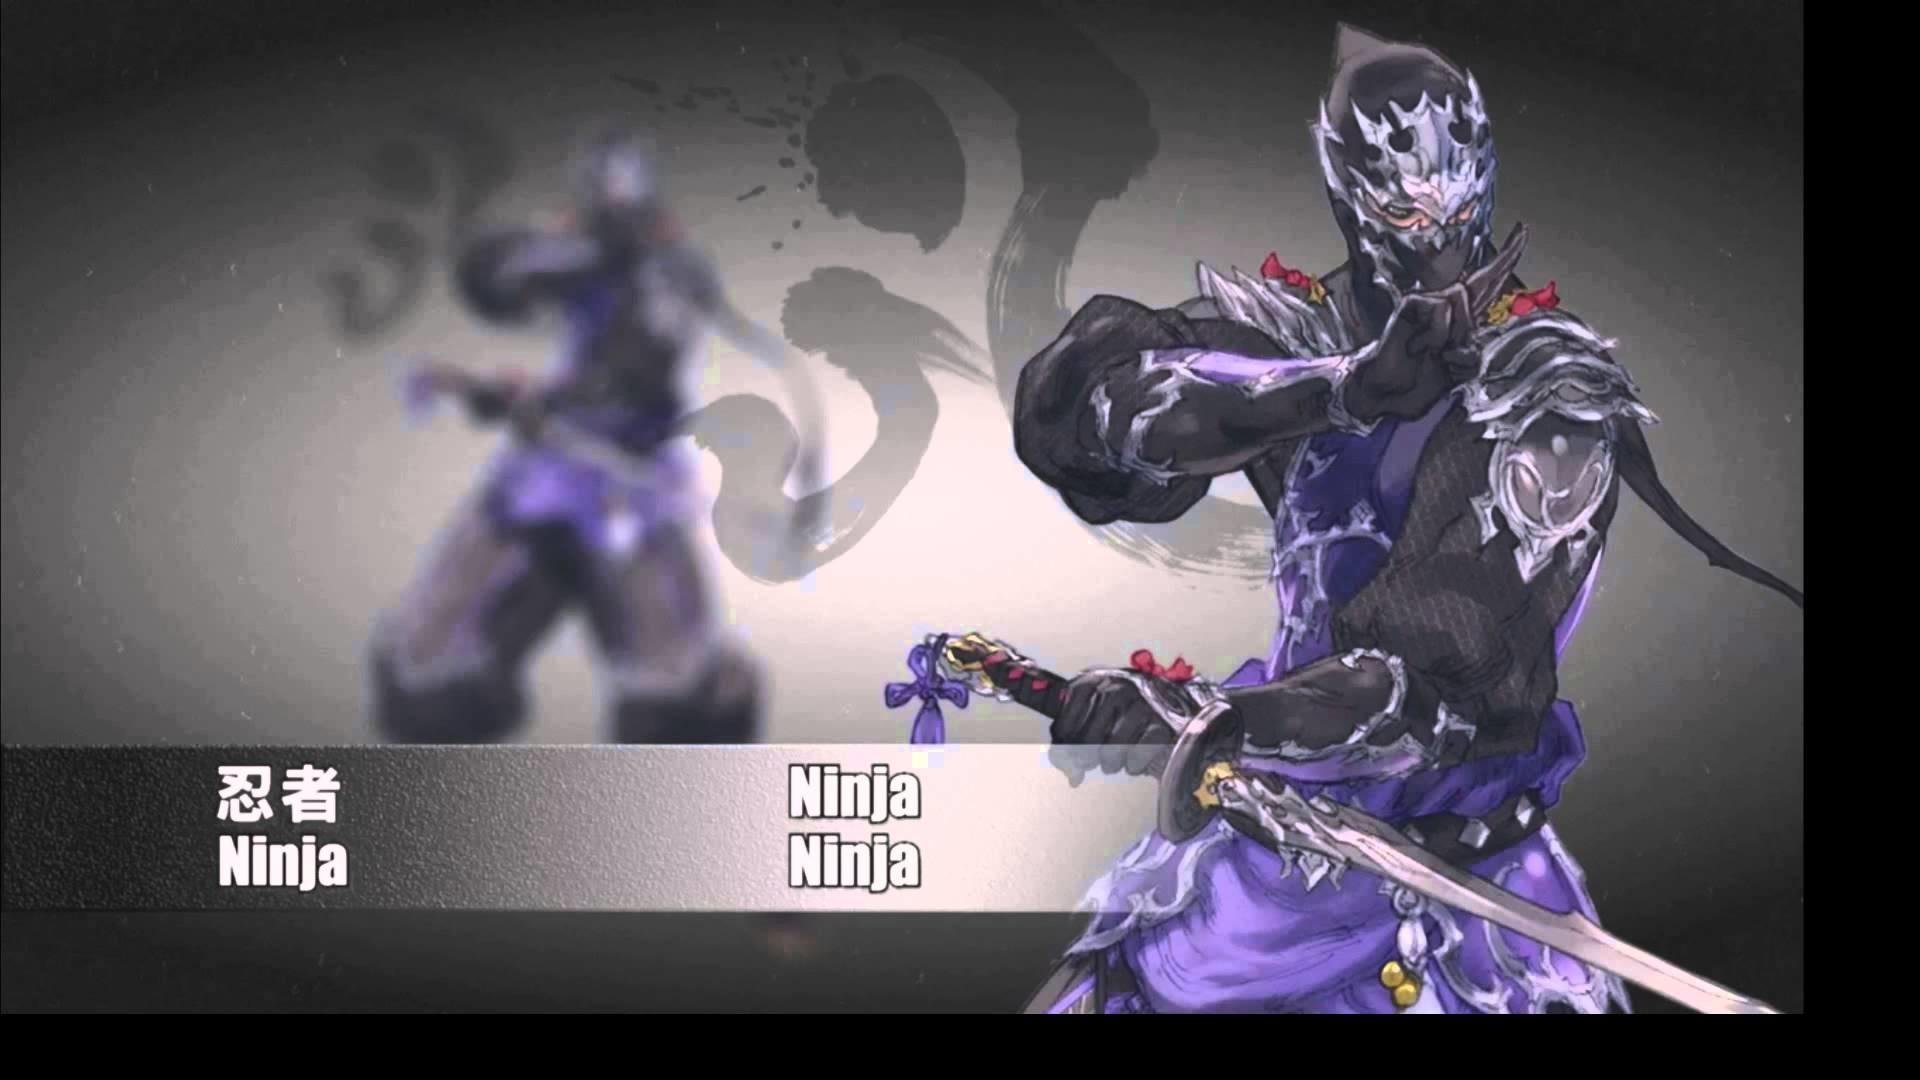 FFXIV Heavensward Ninja Skills/Action Trailer